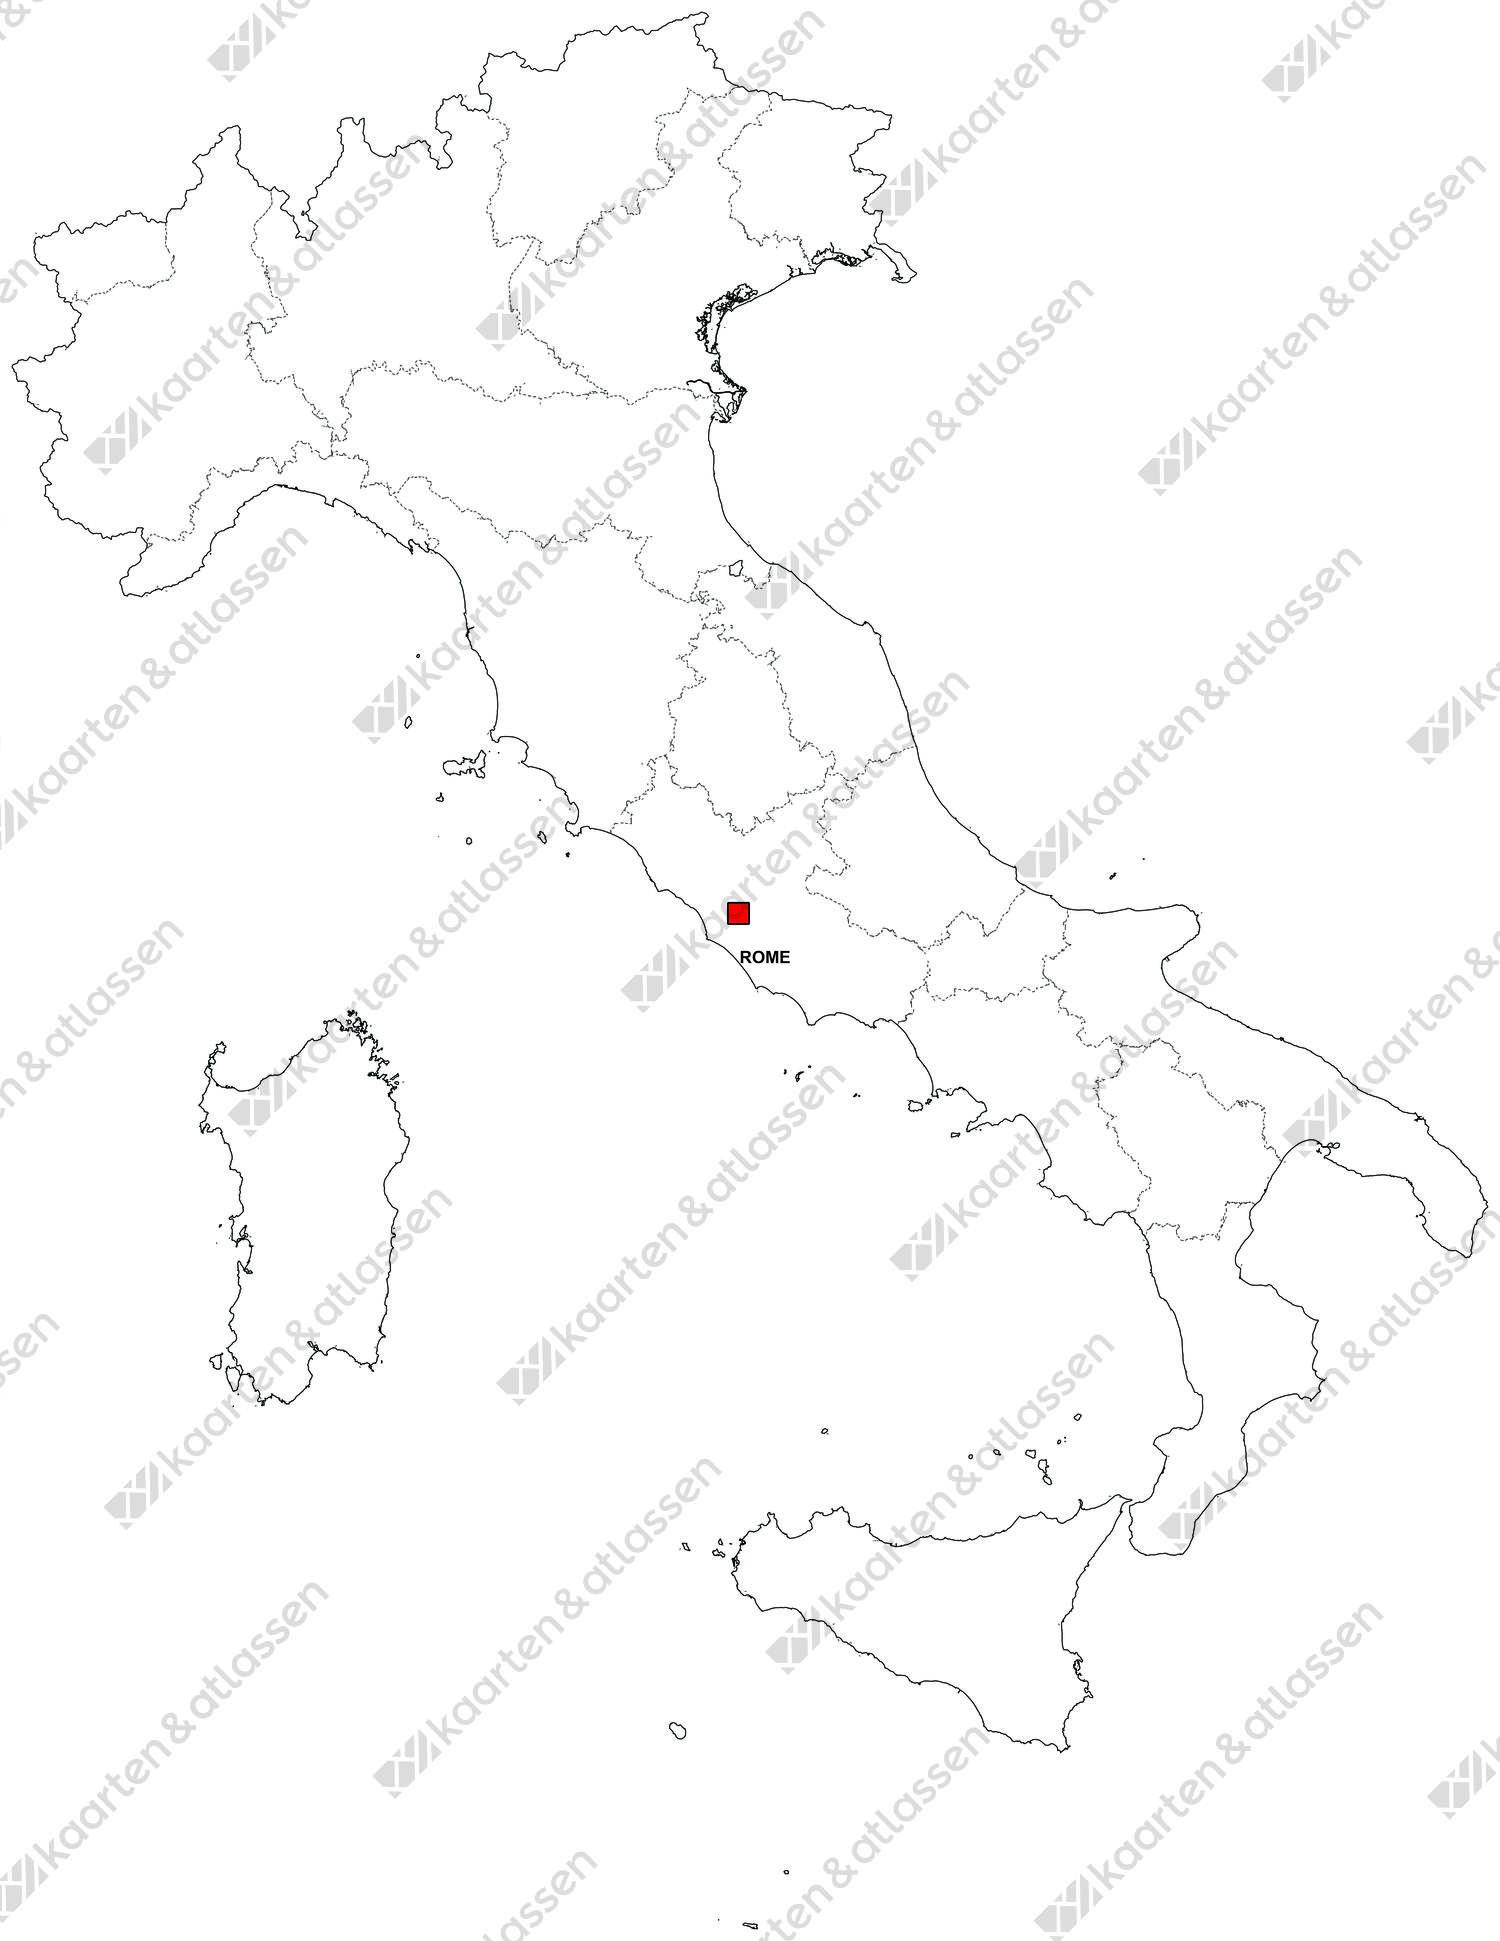 Gratis digitale kaart Italië